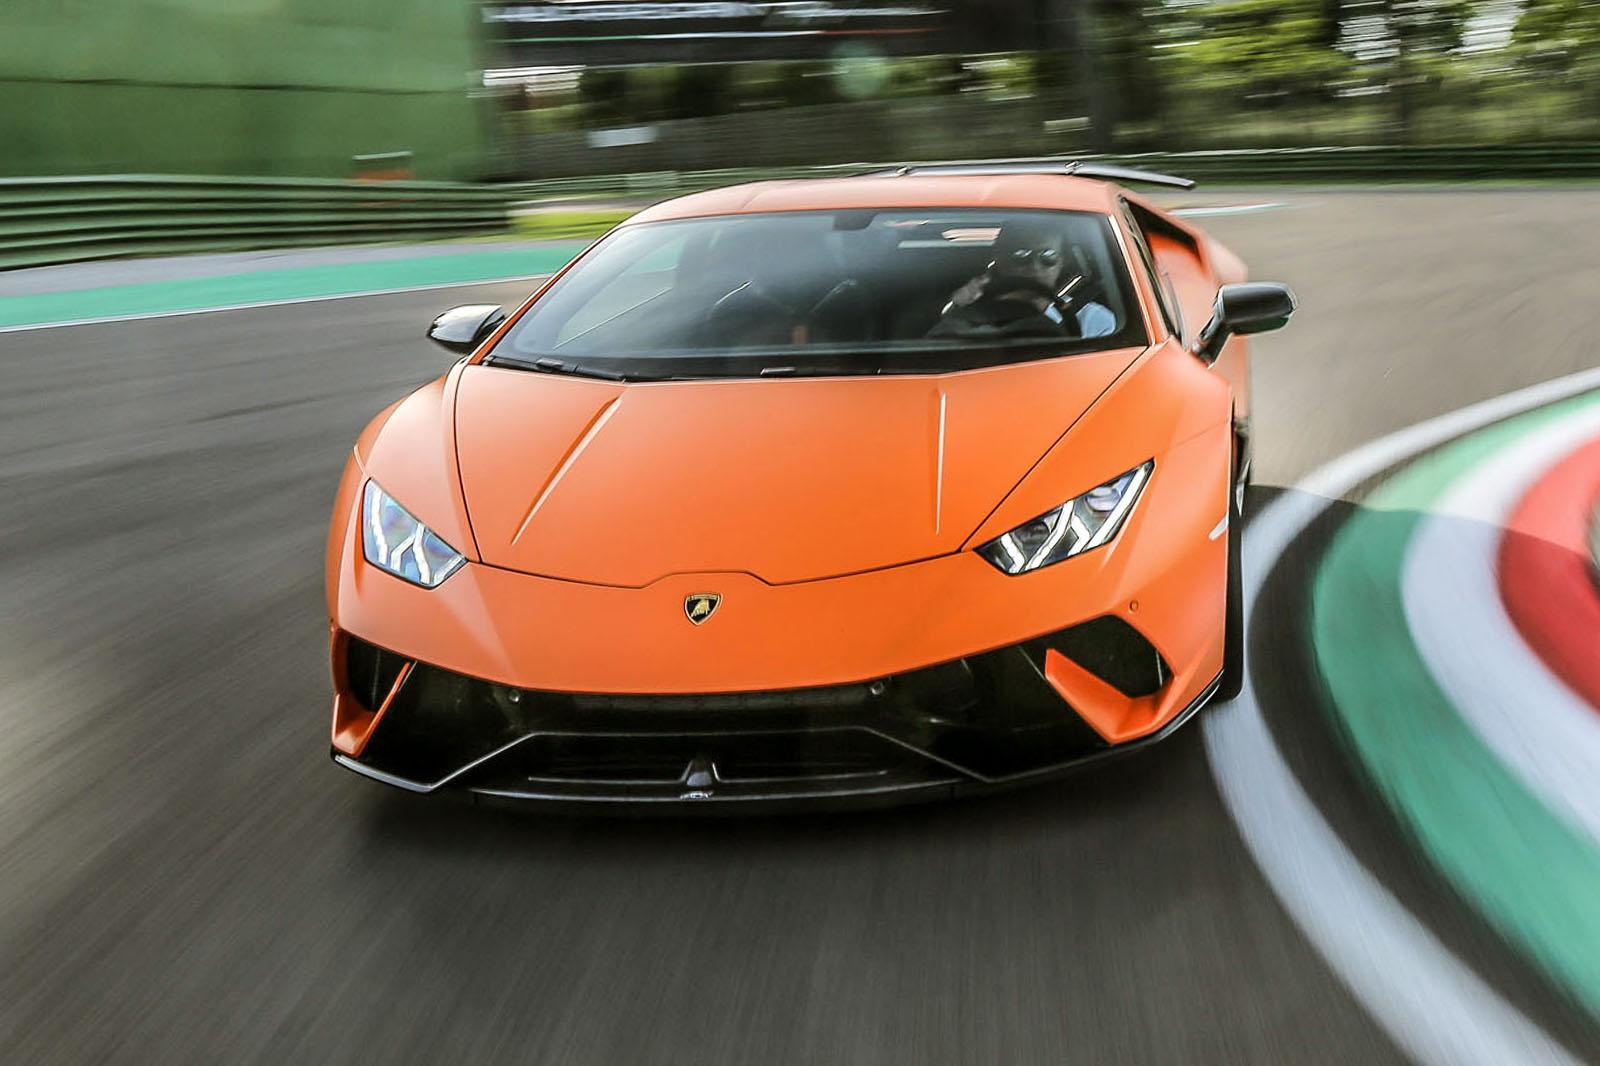 Lamborghini Huracan Performante 2017 review | Autocar